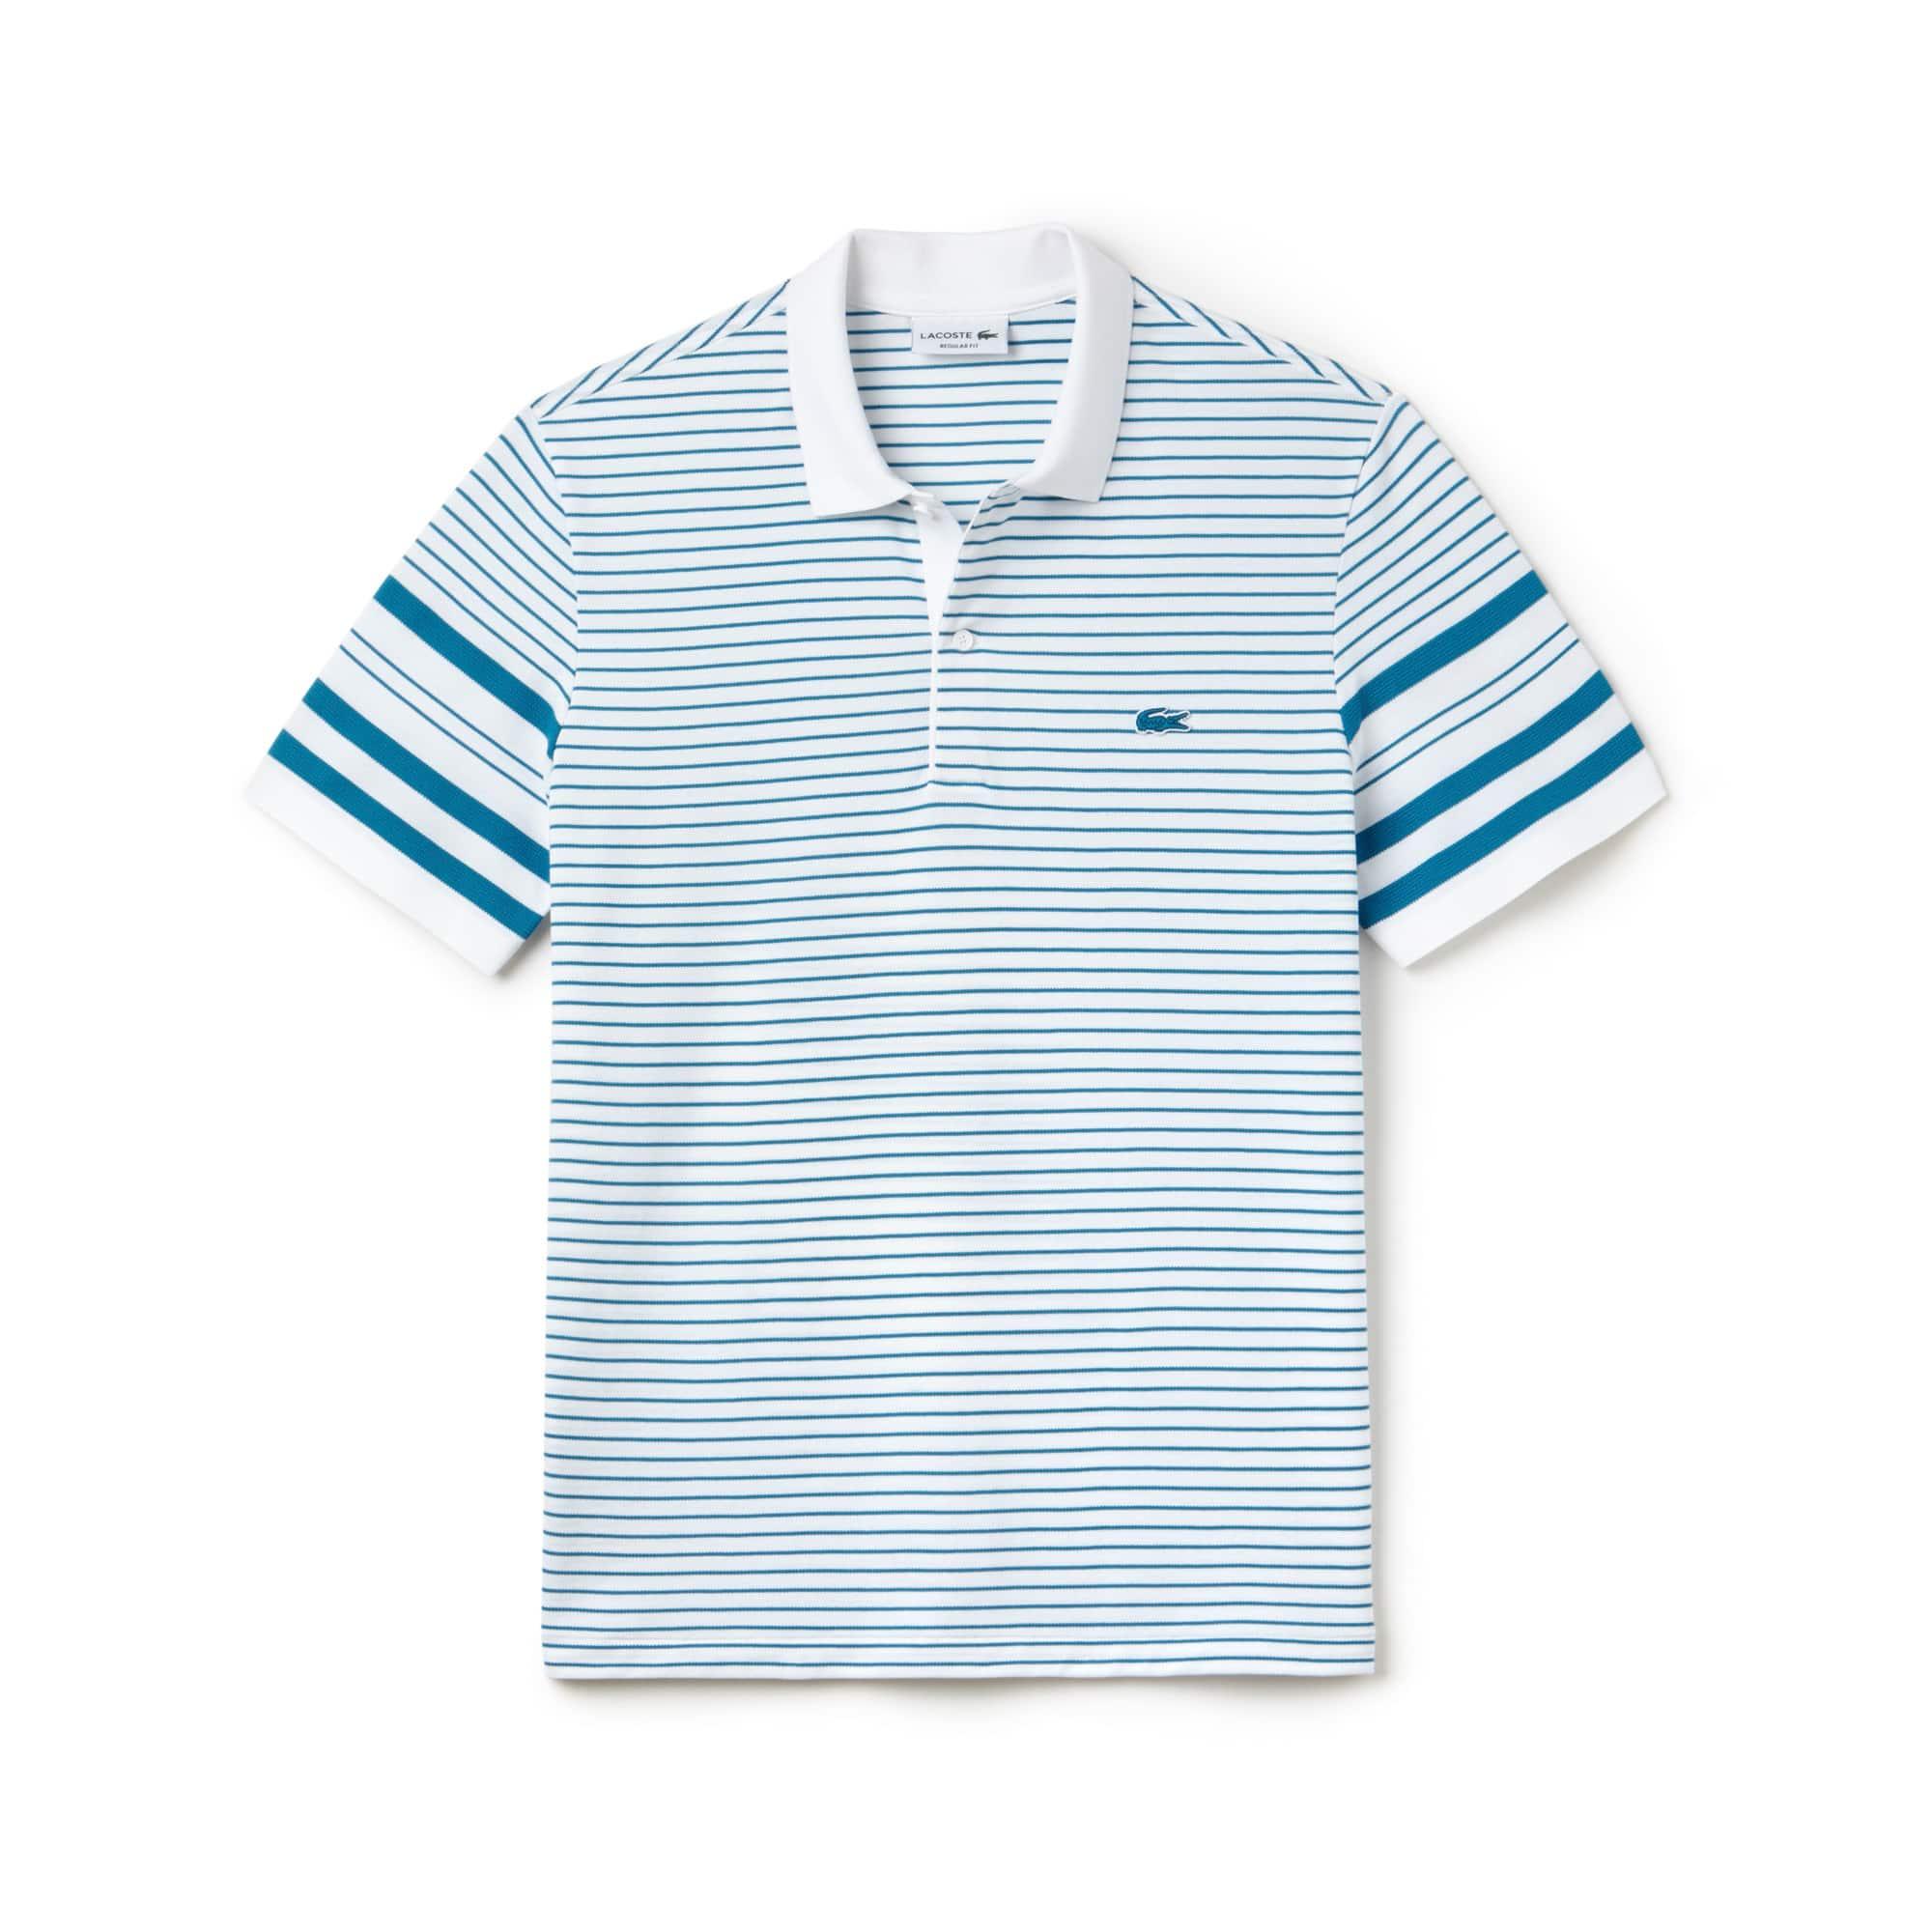 Men's Regular Fit Mixed Stripes Cotton Piqué Polo Shirt